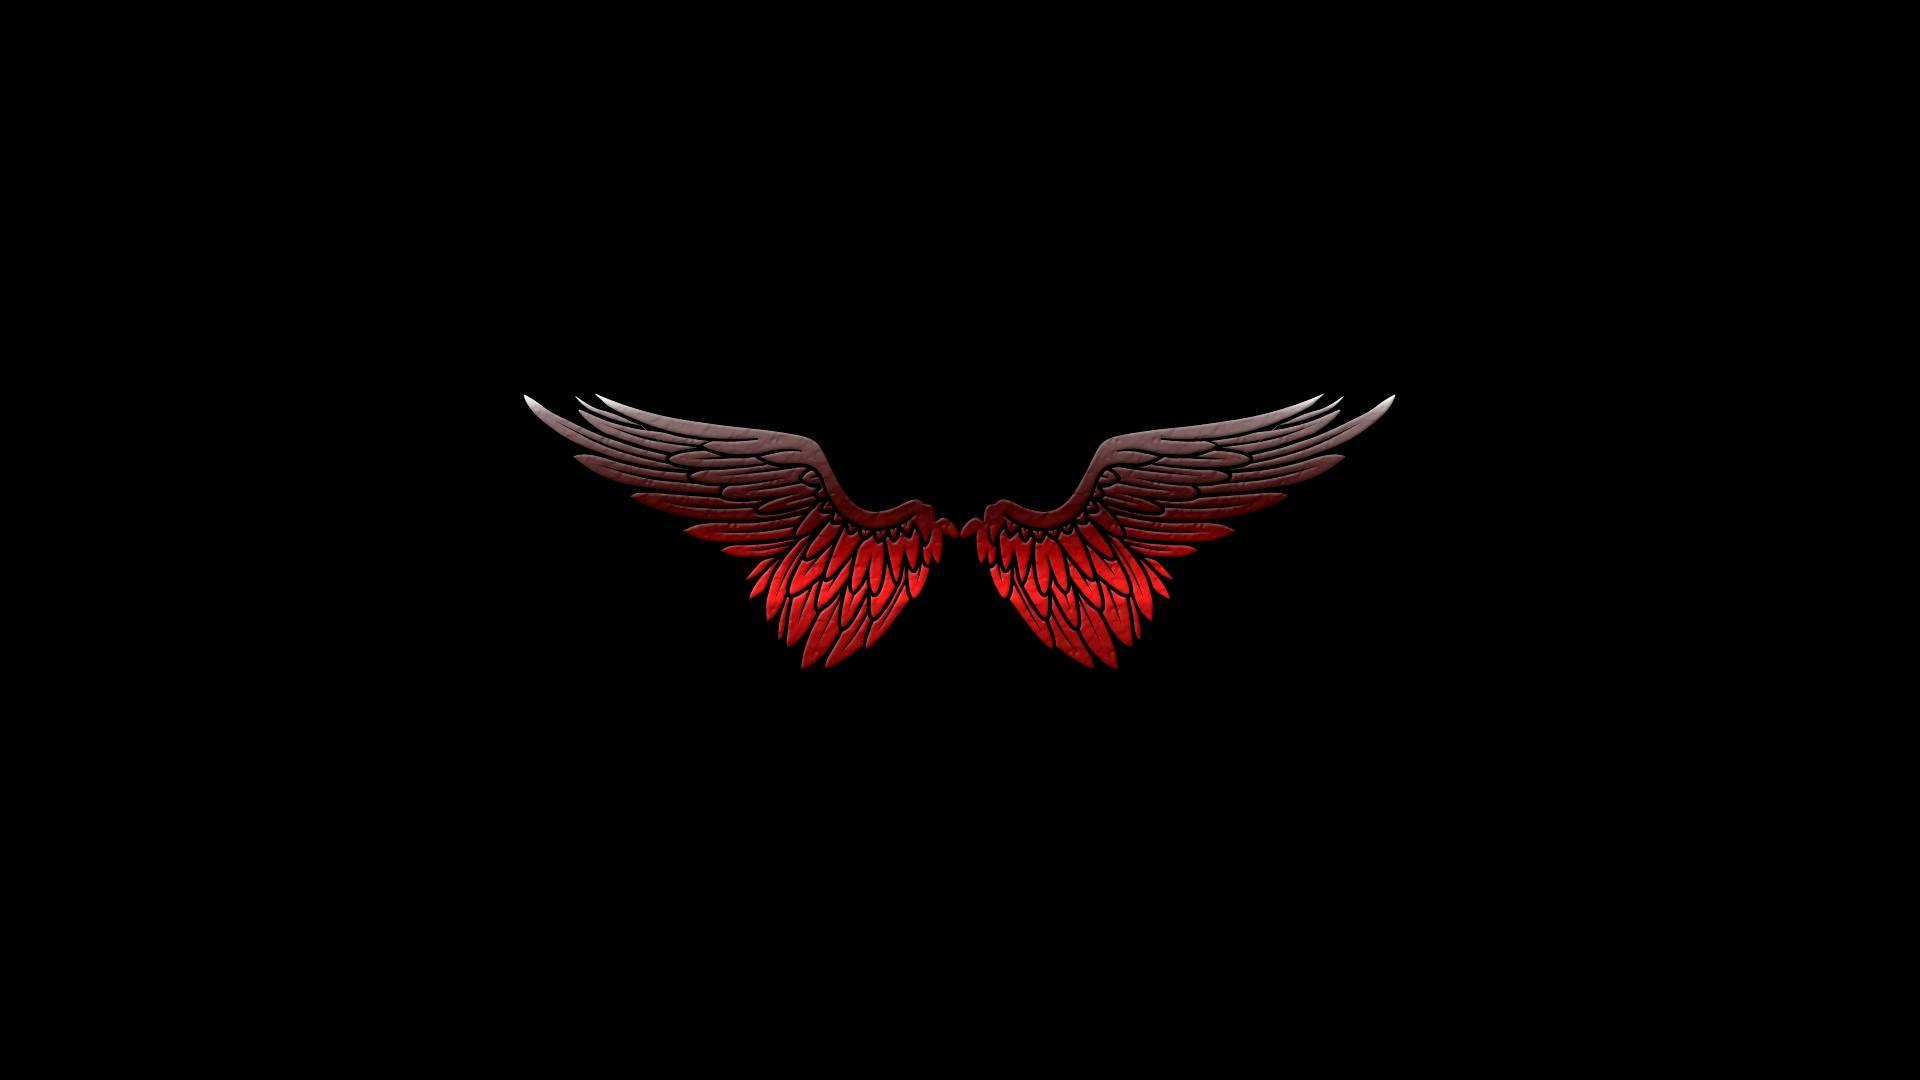 Angels Wings 19201080 Wallpaper 2174900 1920x1080